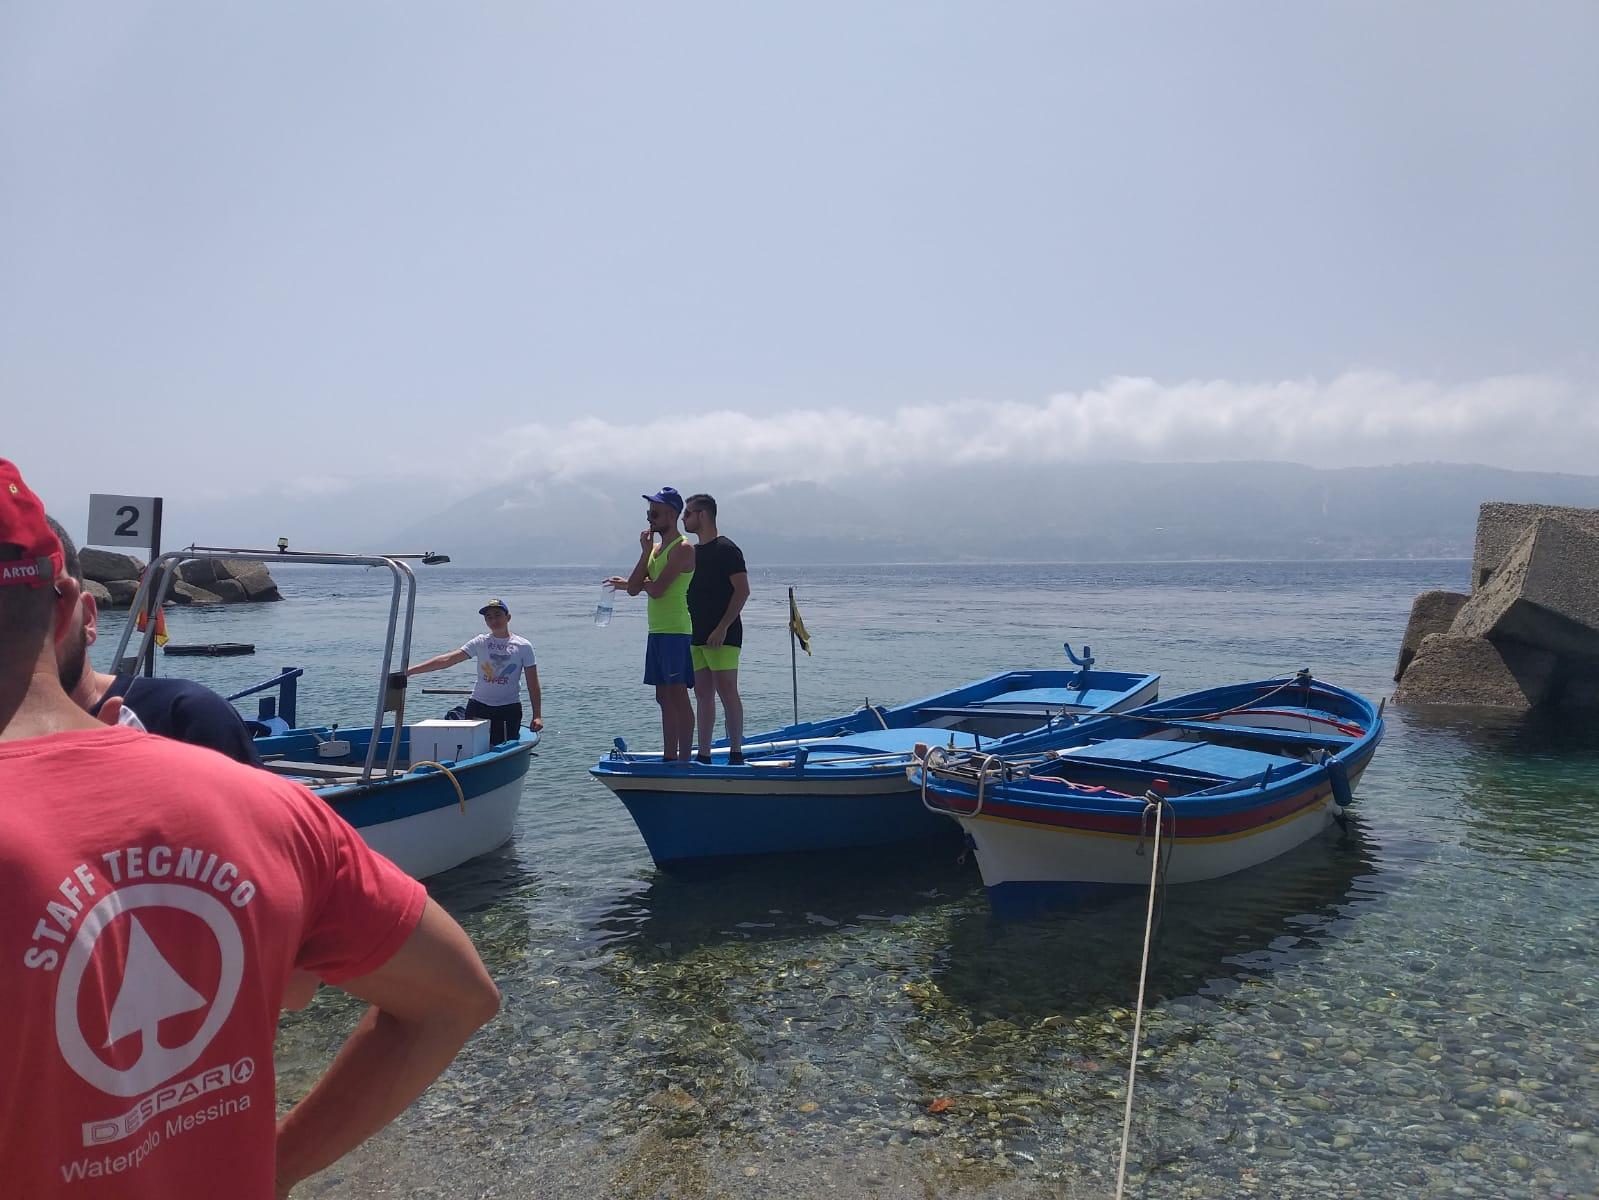 Le barche ormeggiate - Insieme oltre le onde